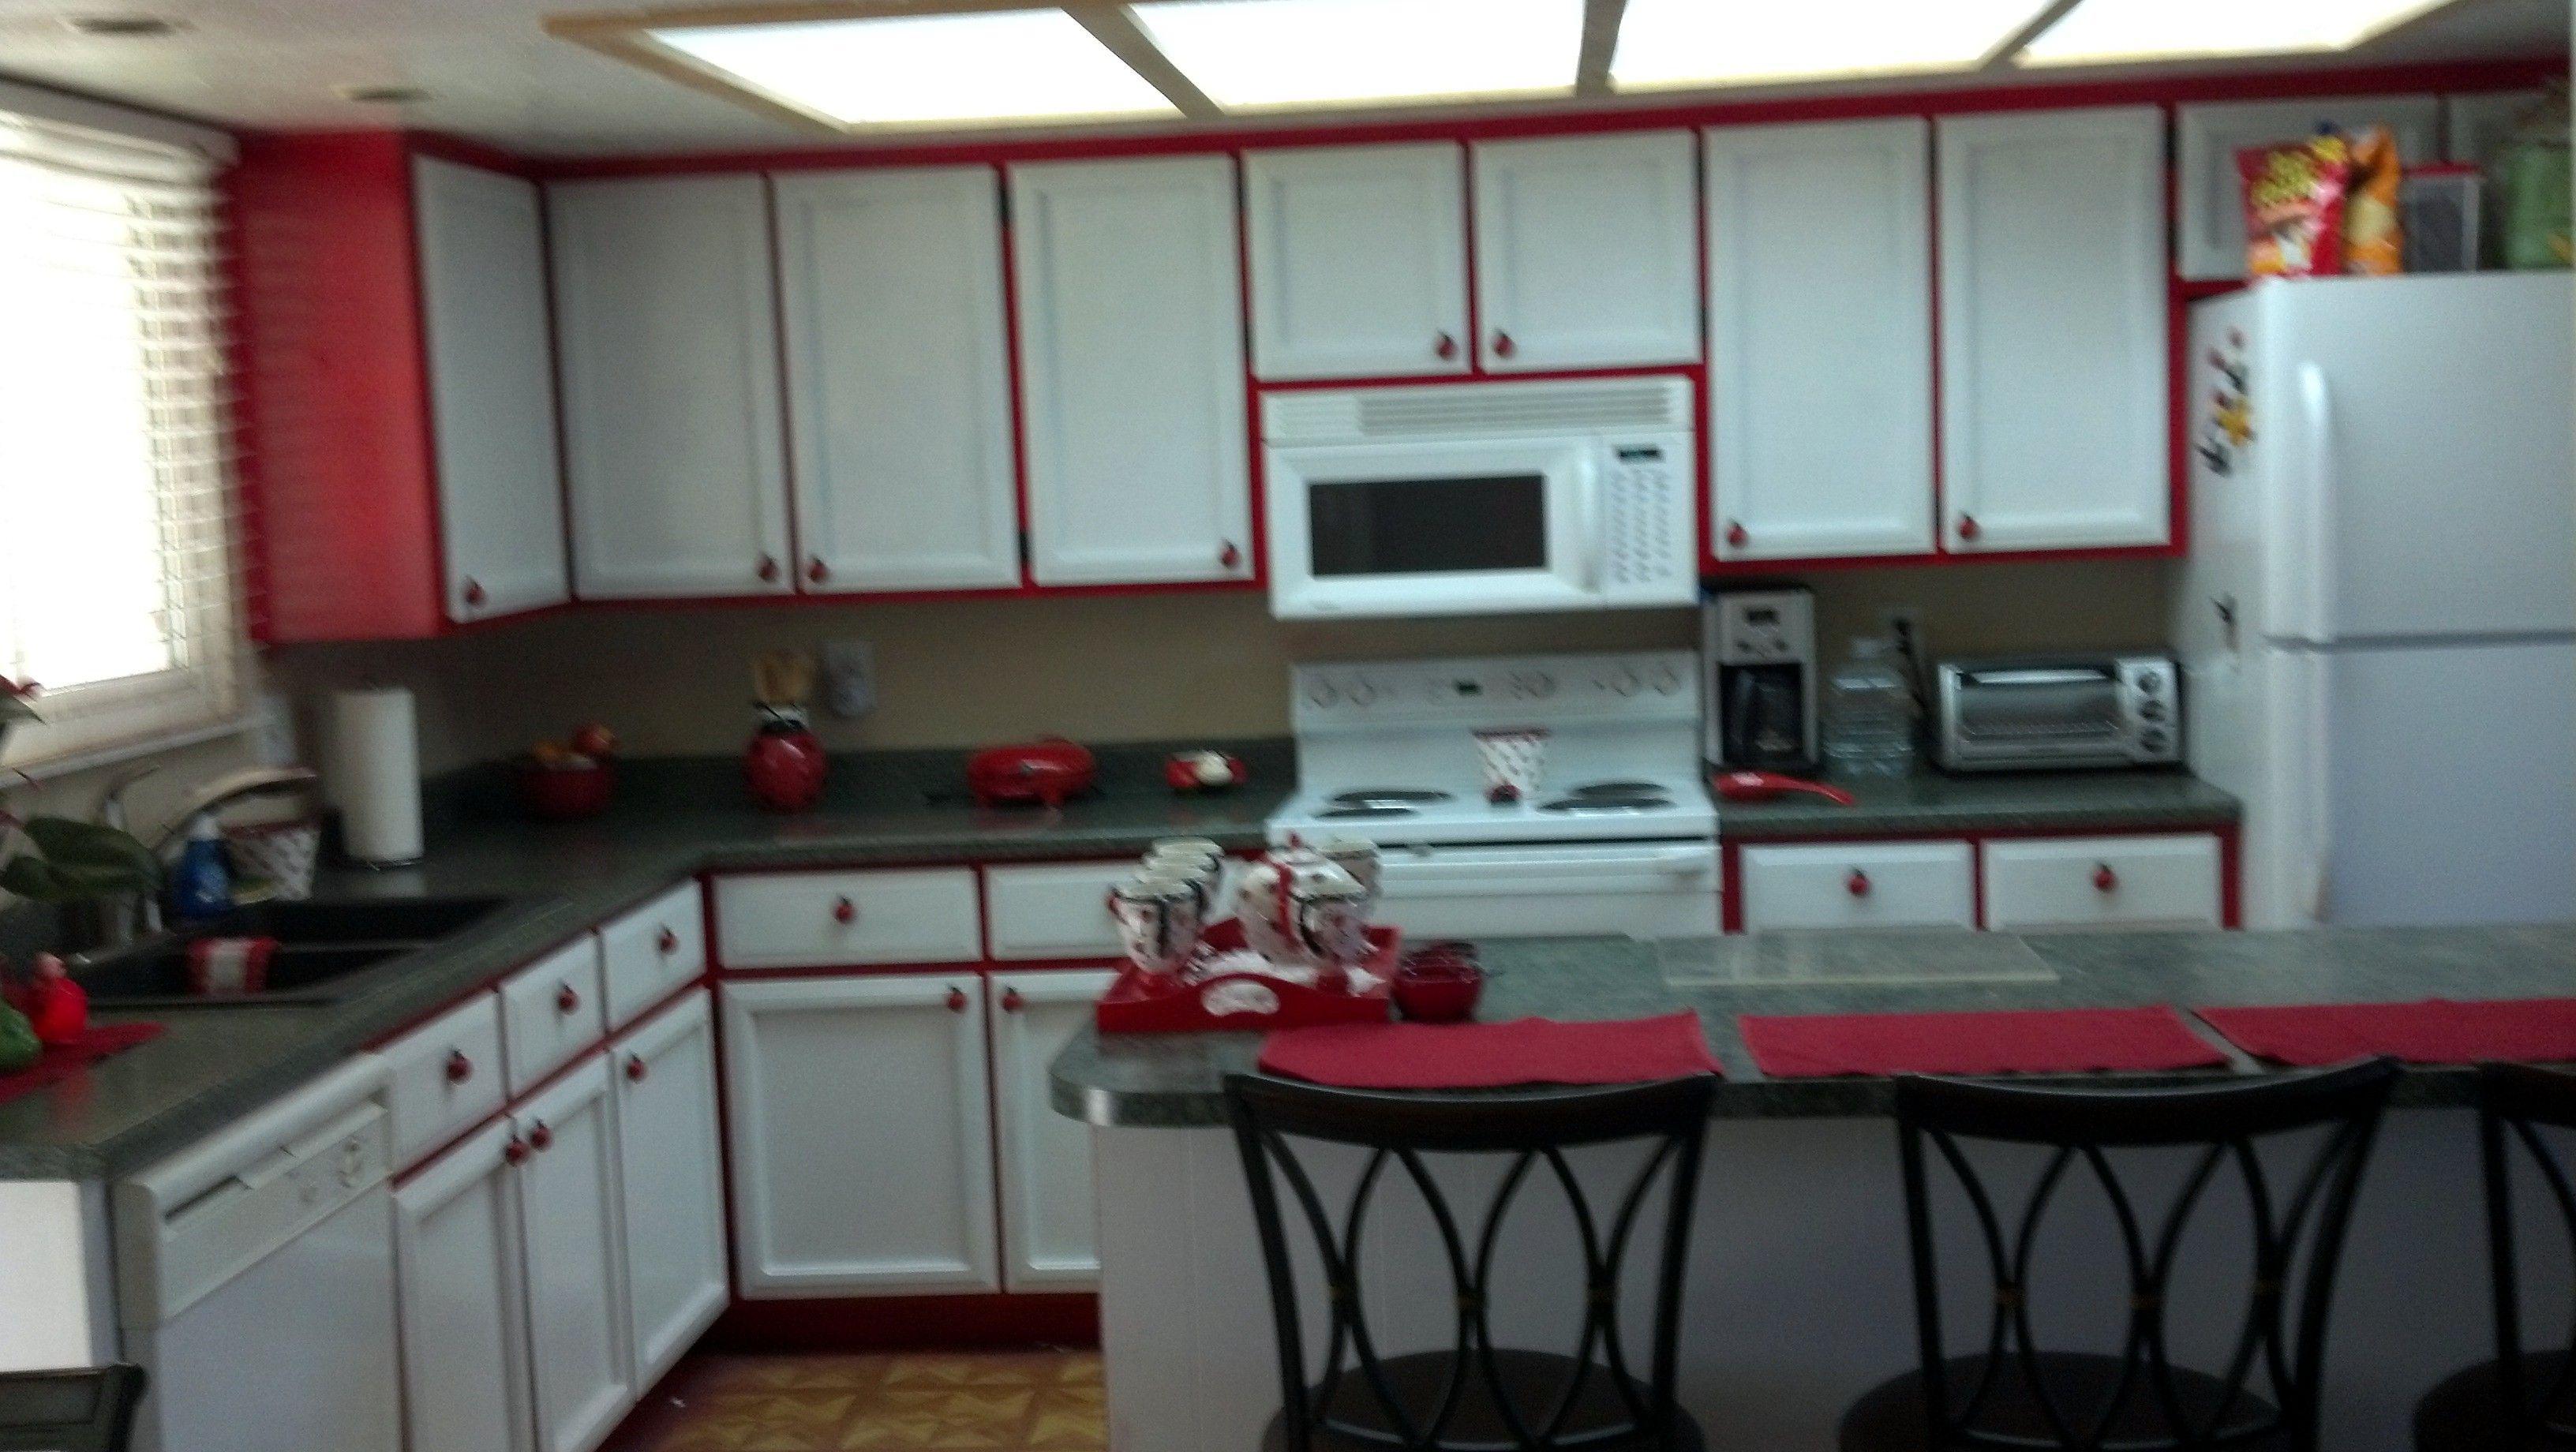 My Newly Painted Ladybug Kitchen New Kitchen Kitchen Kitchen Paint